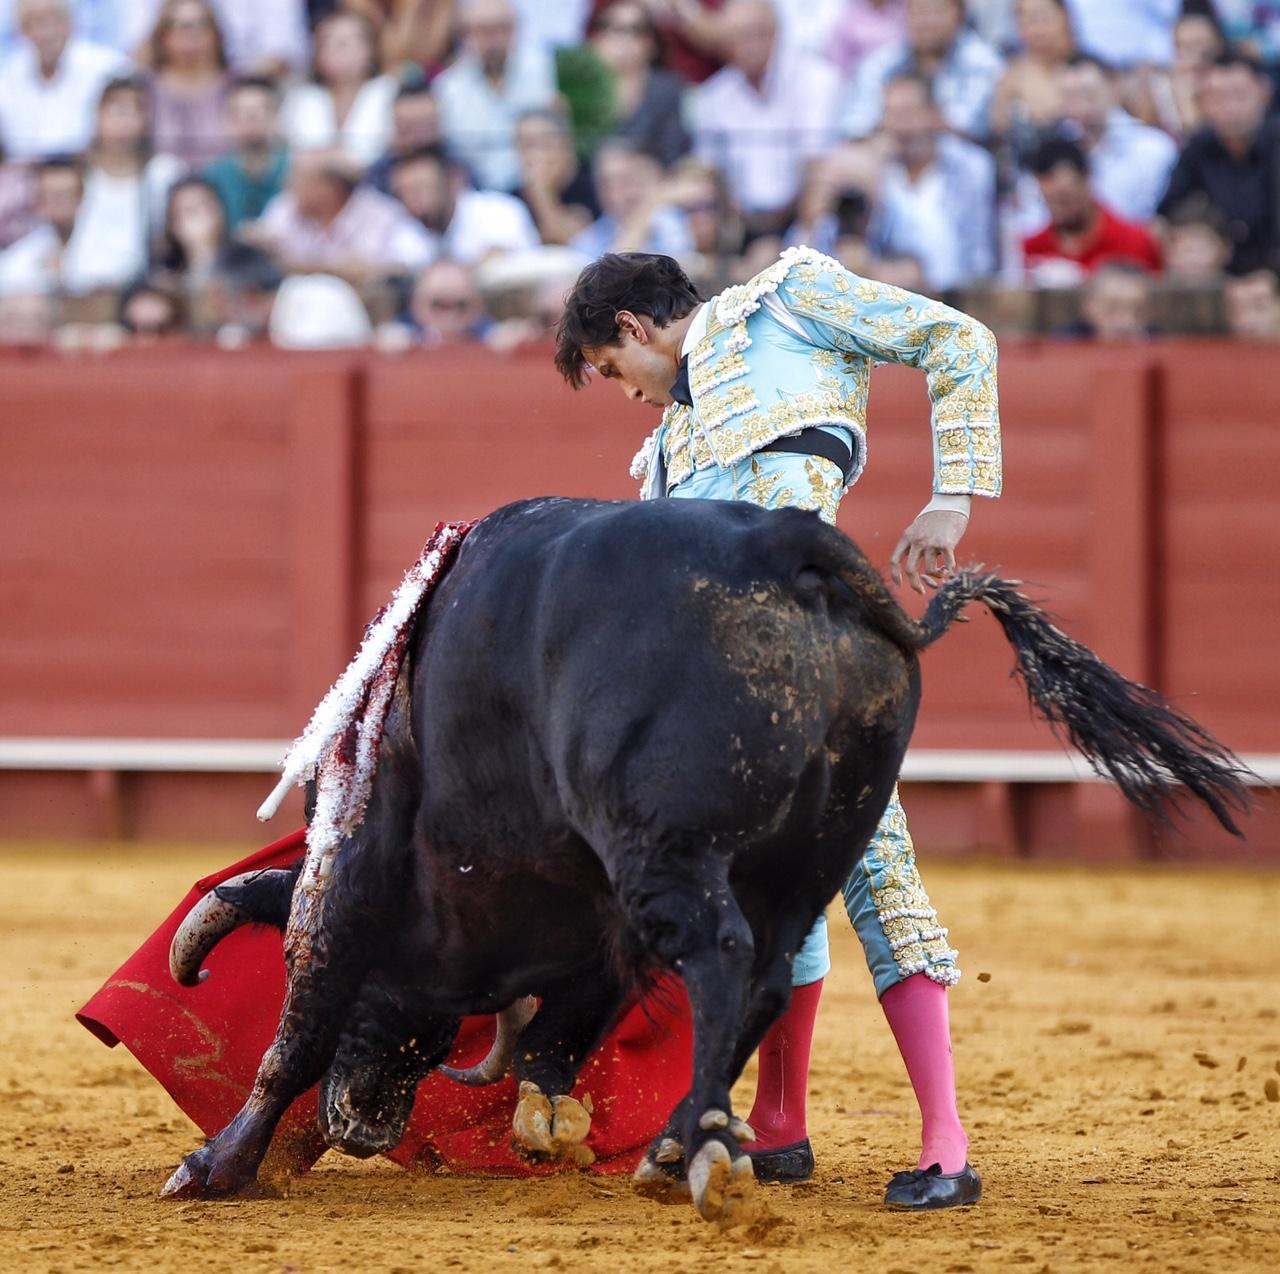 Talavante succeeds in closing San Miguel and Rafael Serna gets hurt